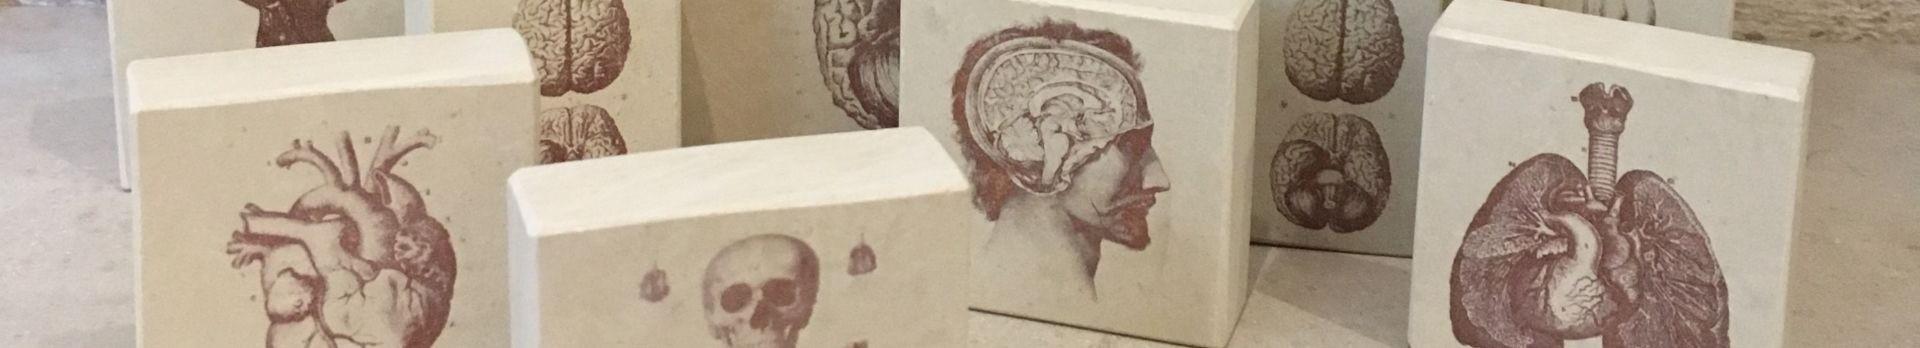 Minilitos estampas sobre piedra